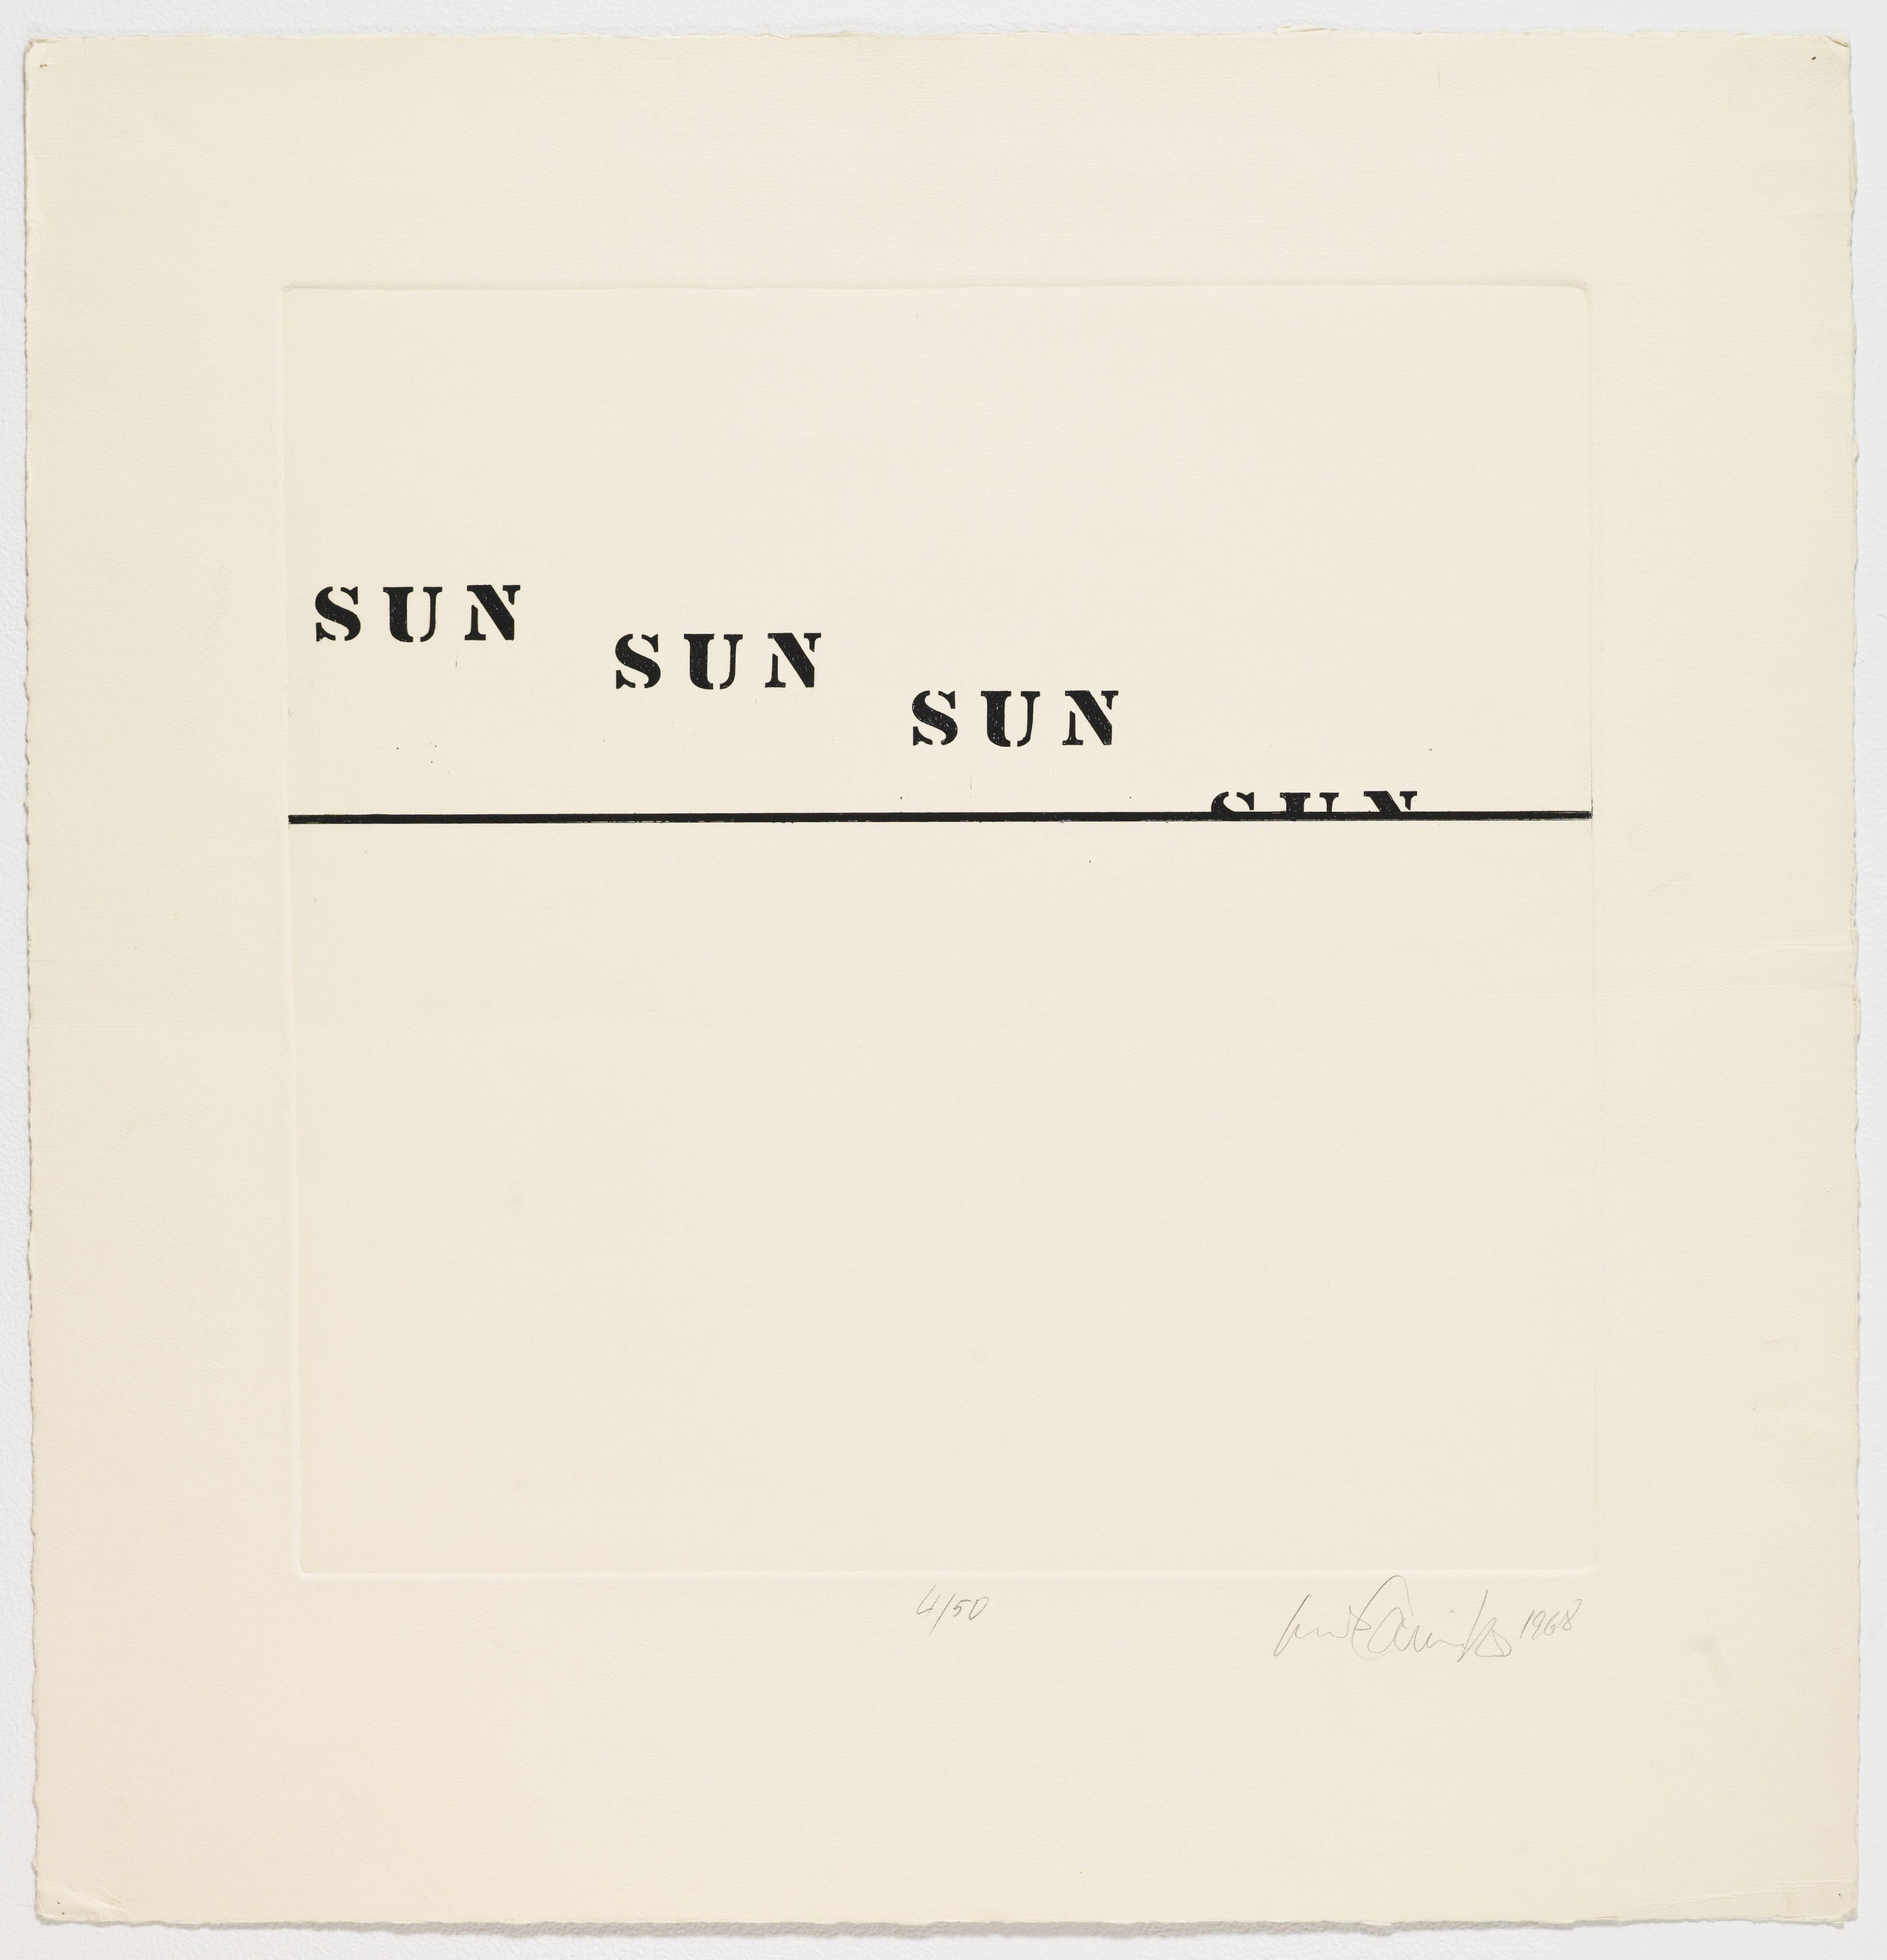 Luis Camnitzer, Untitled, 1968